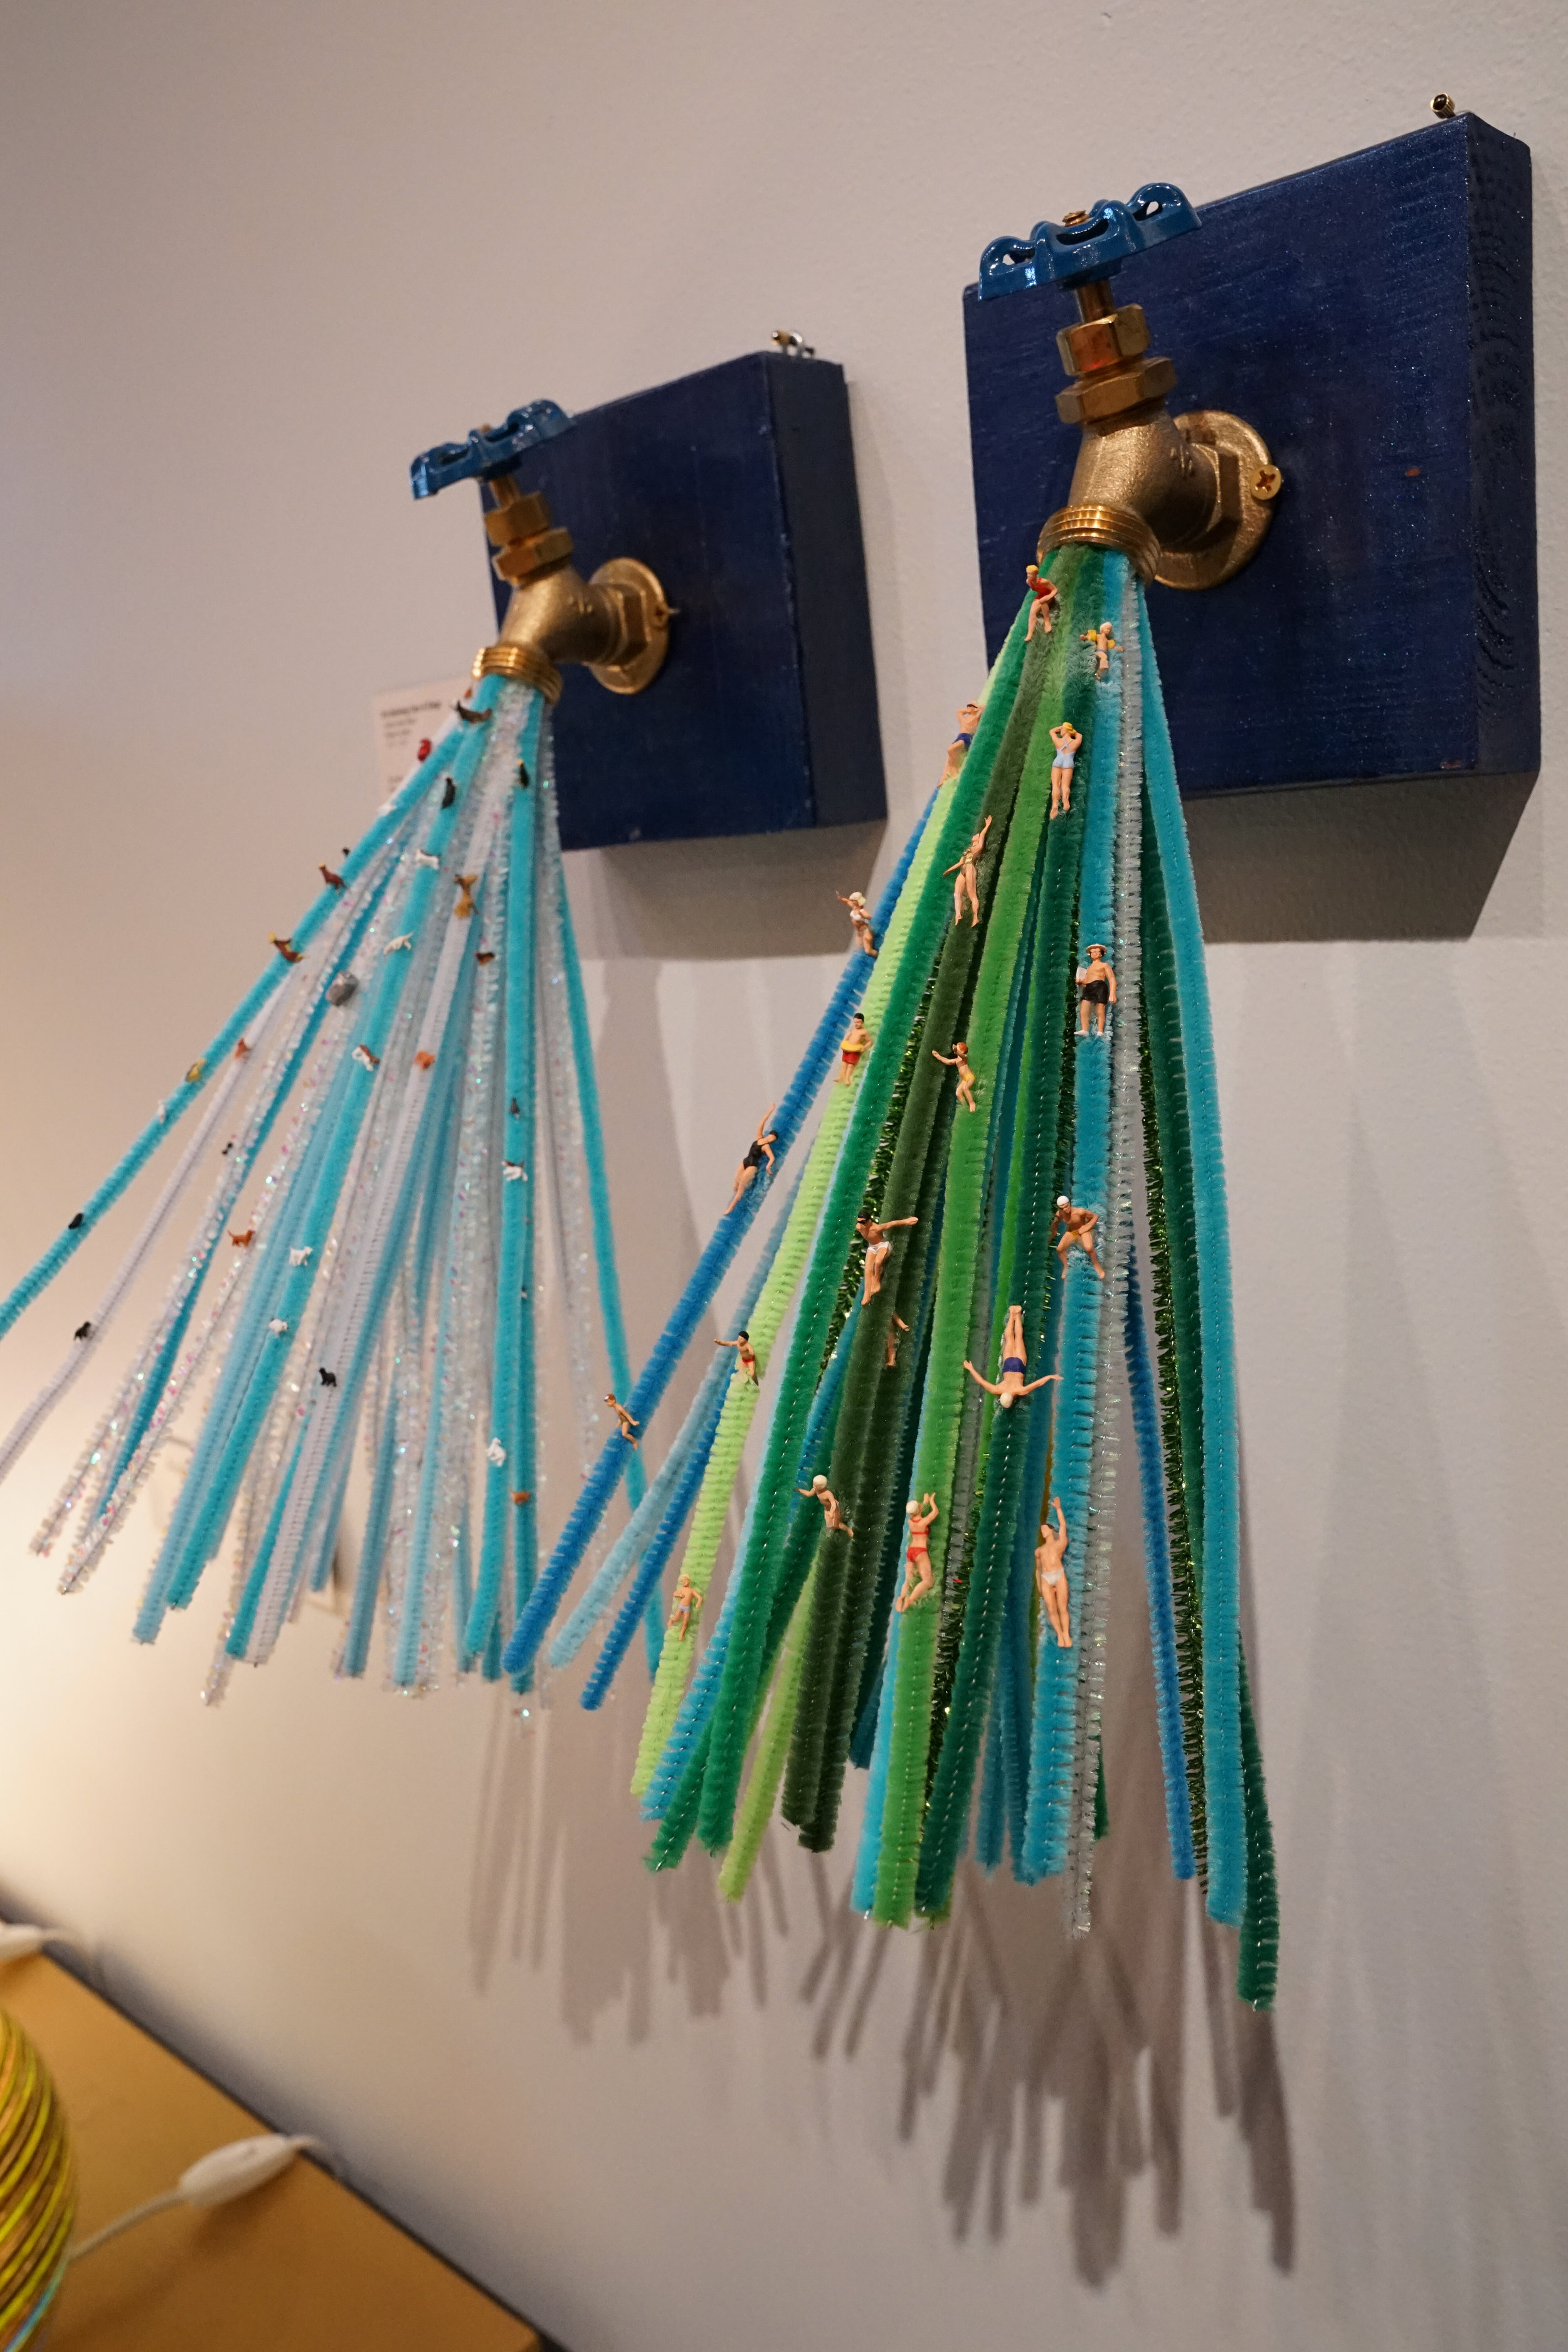 Hallie Rae Ward - East Austin Studio Tour - 6 - Austin Art - Austin Artist - Contemporary Art